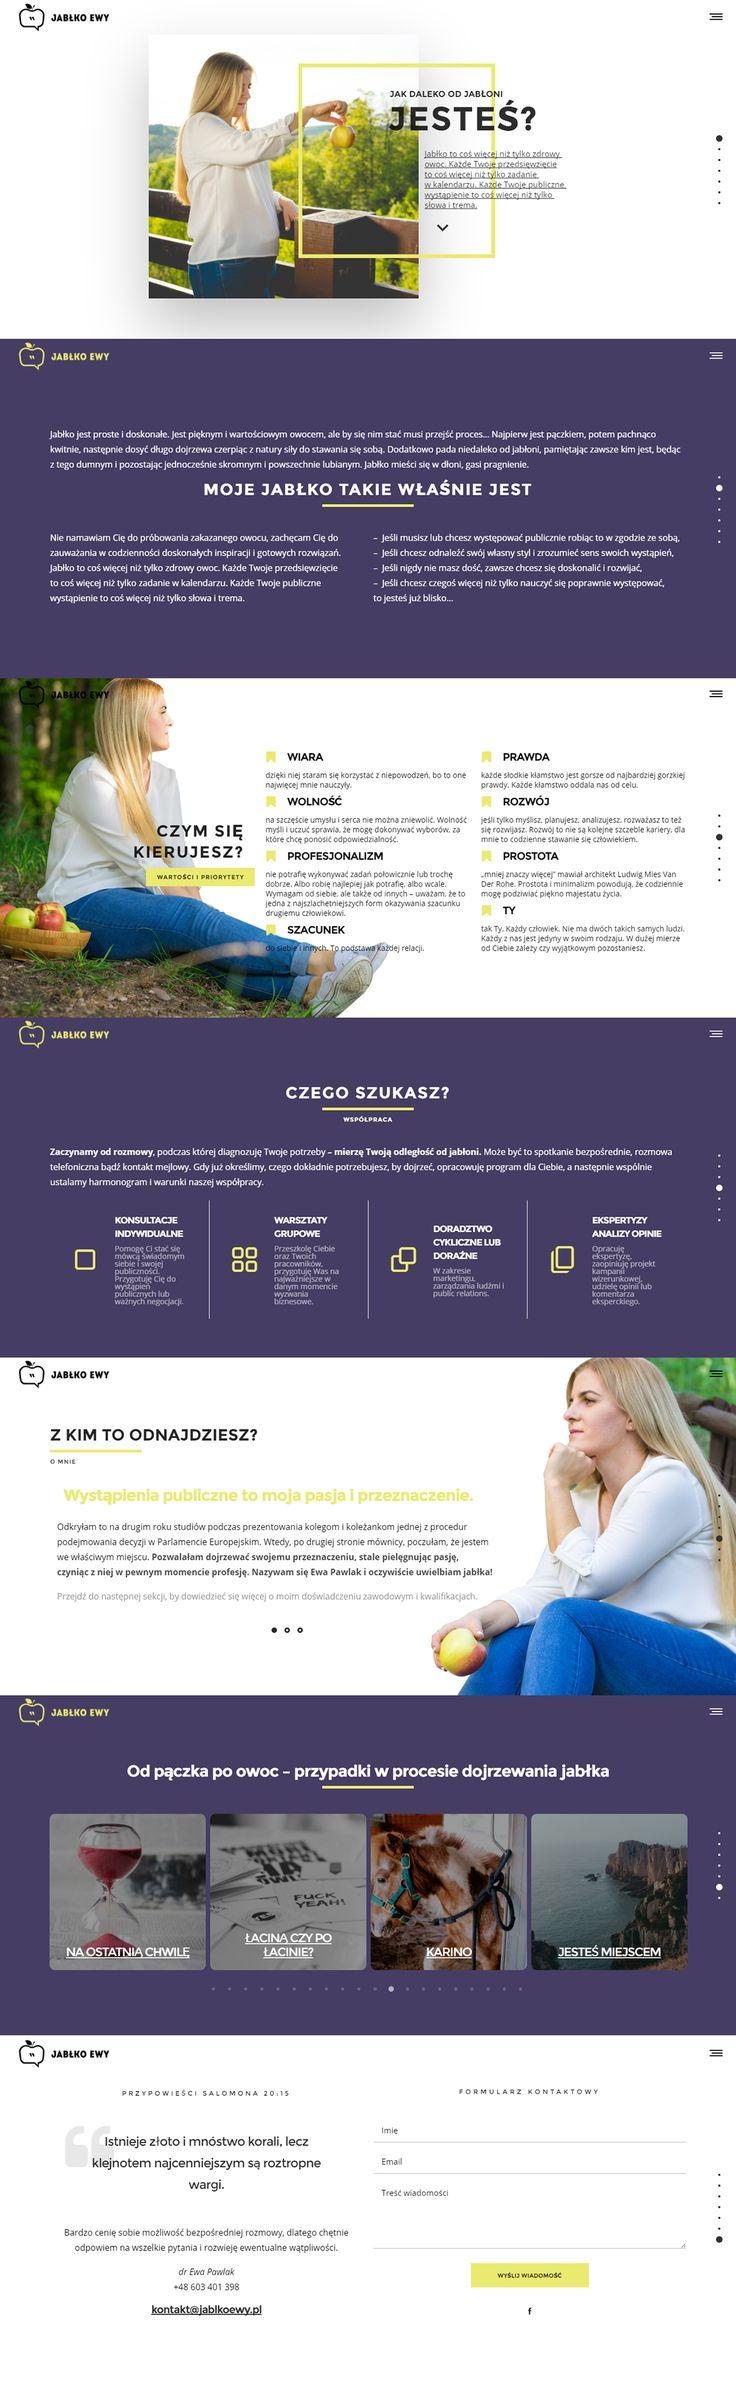 Website layout design, one page scroll, Brand identity design Jabłko Ewy Public Speaking Coach on Behance